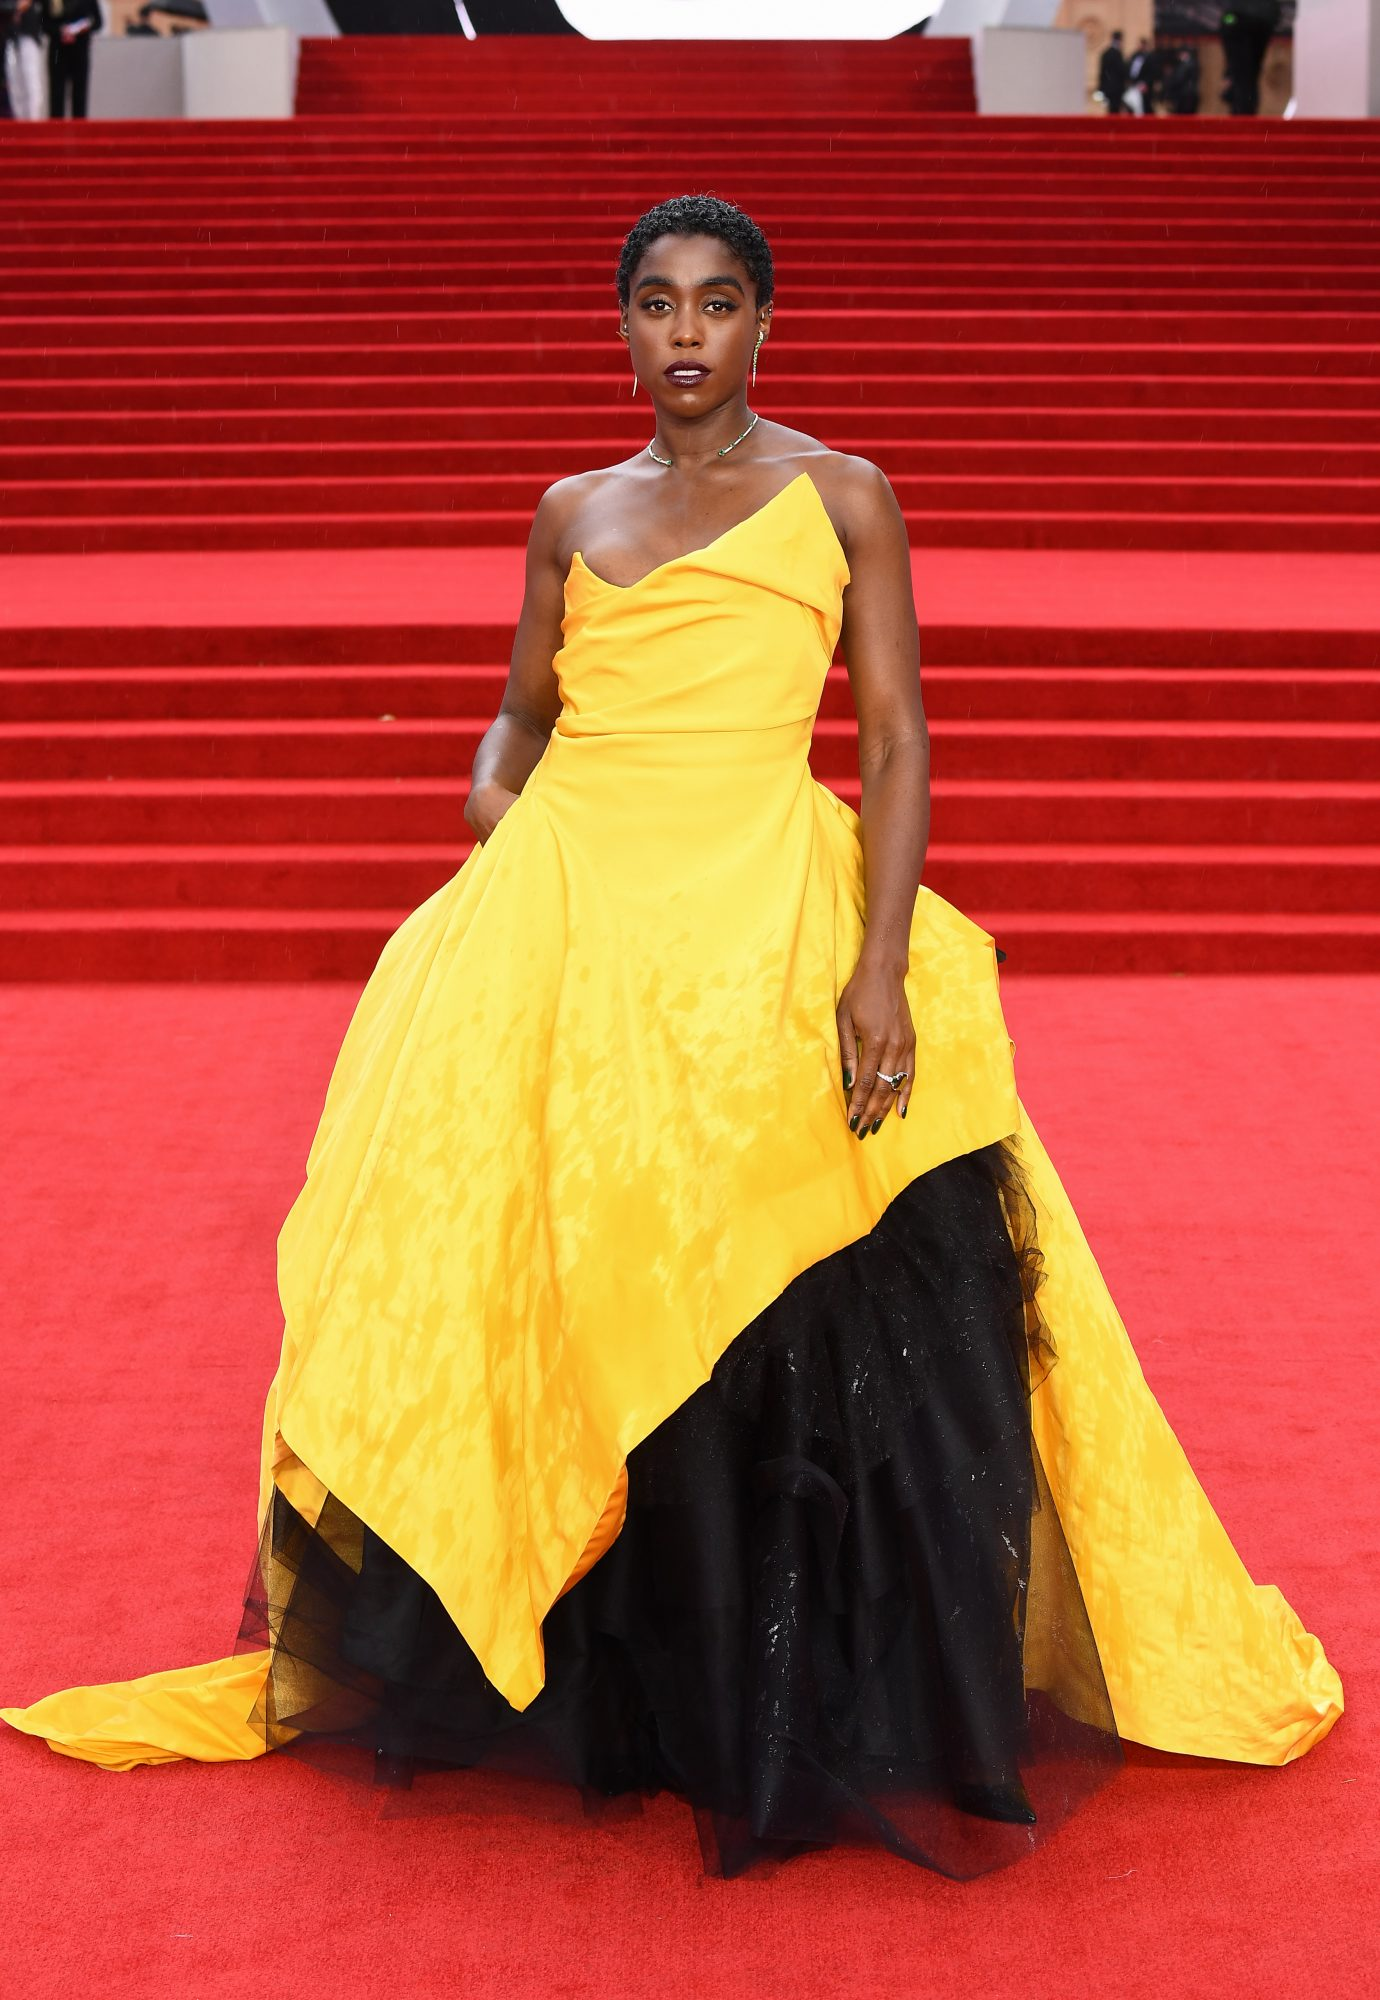 James Bond, No Time to Die estreno, alfombra roja, Lashana Lynch